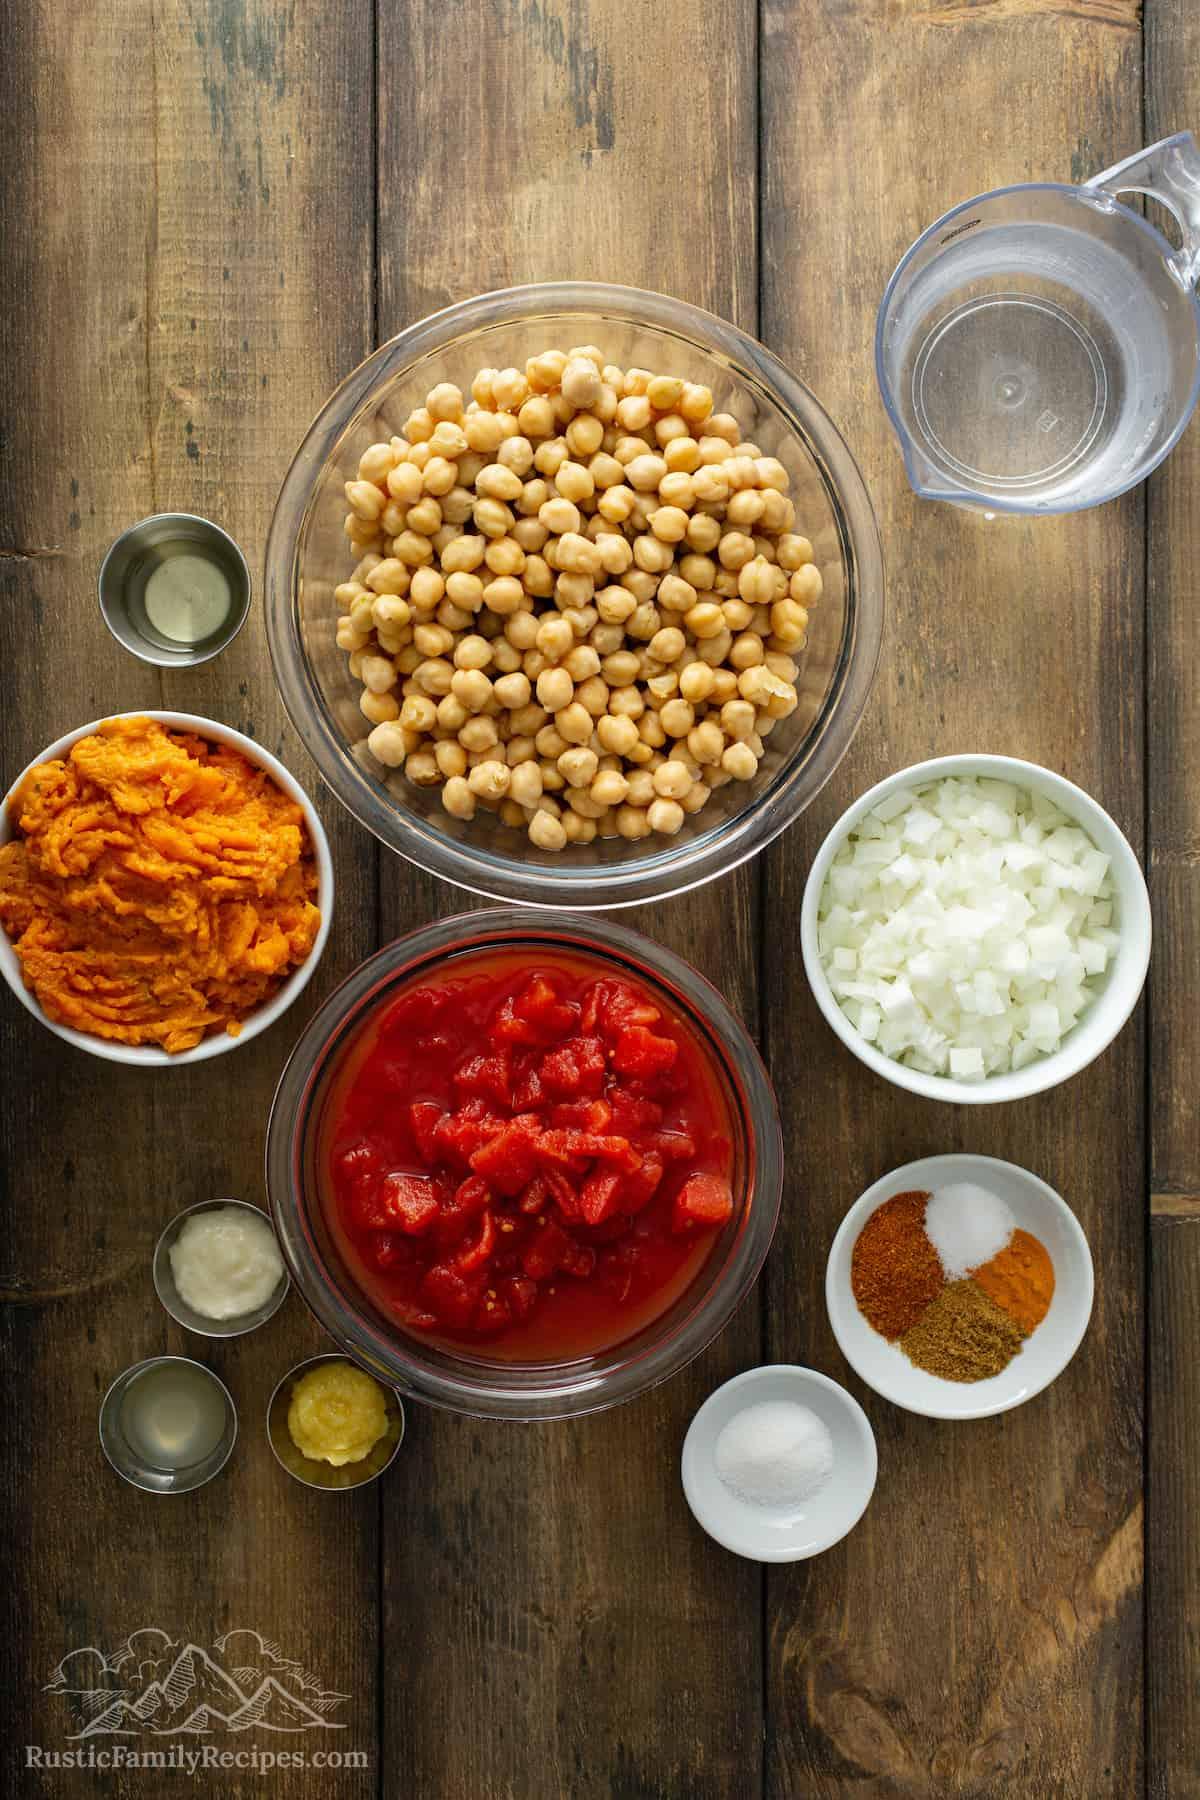 Ingredients for Instant Pot Sweet Potato Chickpea Masala: sweet potato, olive oil, water, chickpeas, onion, diced tomato, lemon juice, cumin, turmeric, garam masala, kosher salt, white sugar, ginger paste, and garlic cloves.